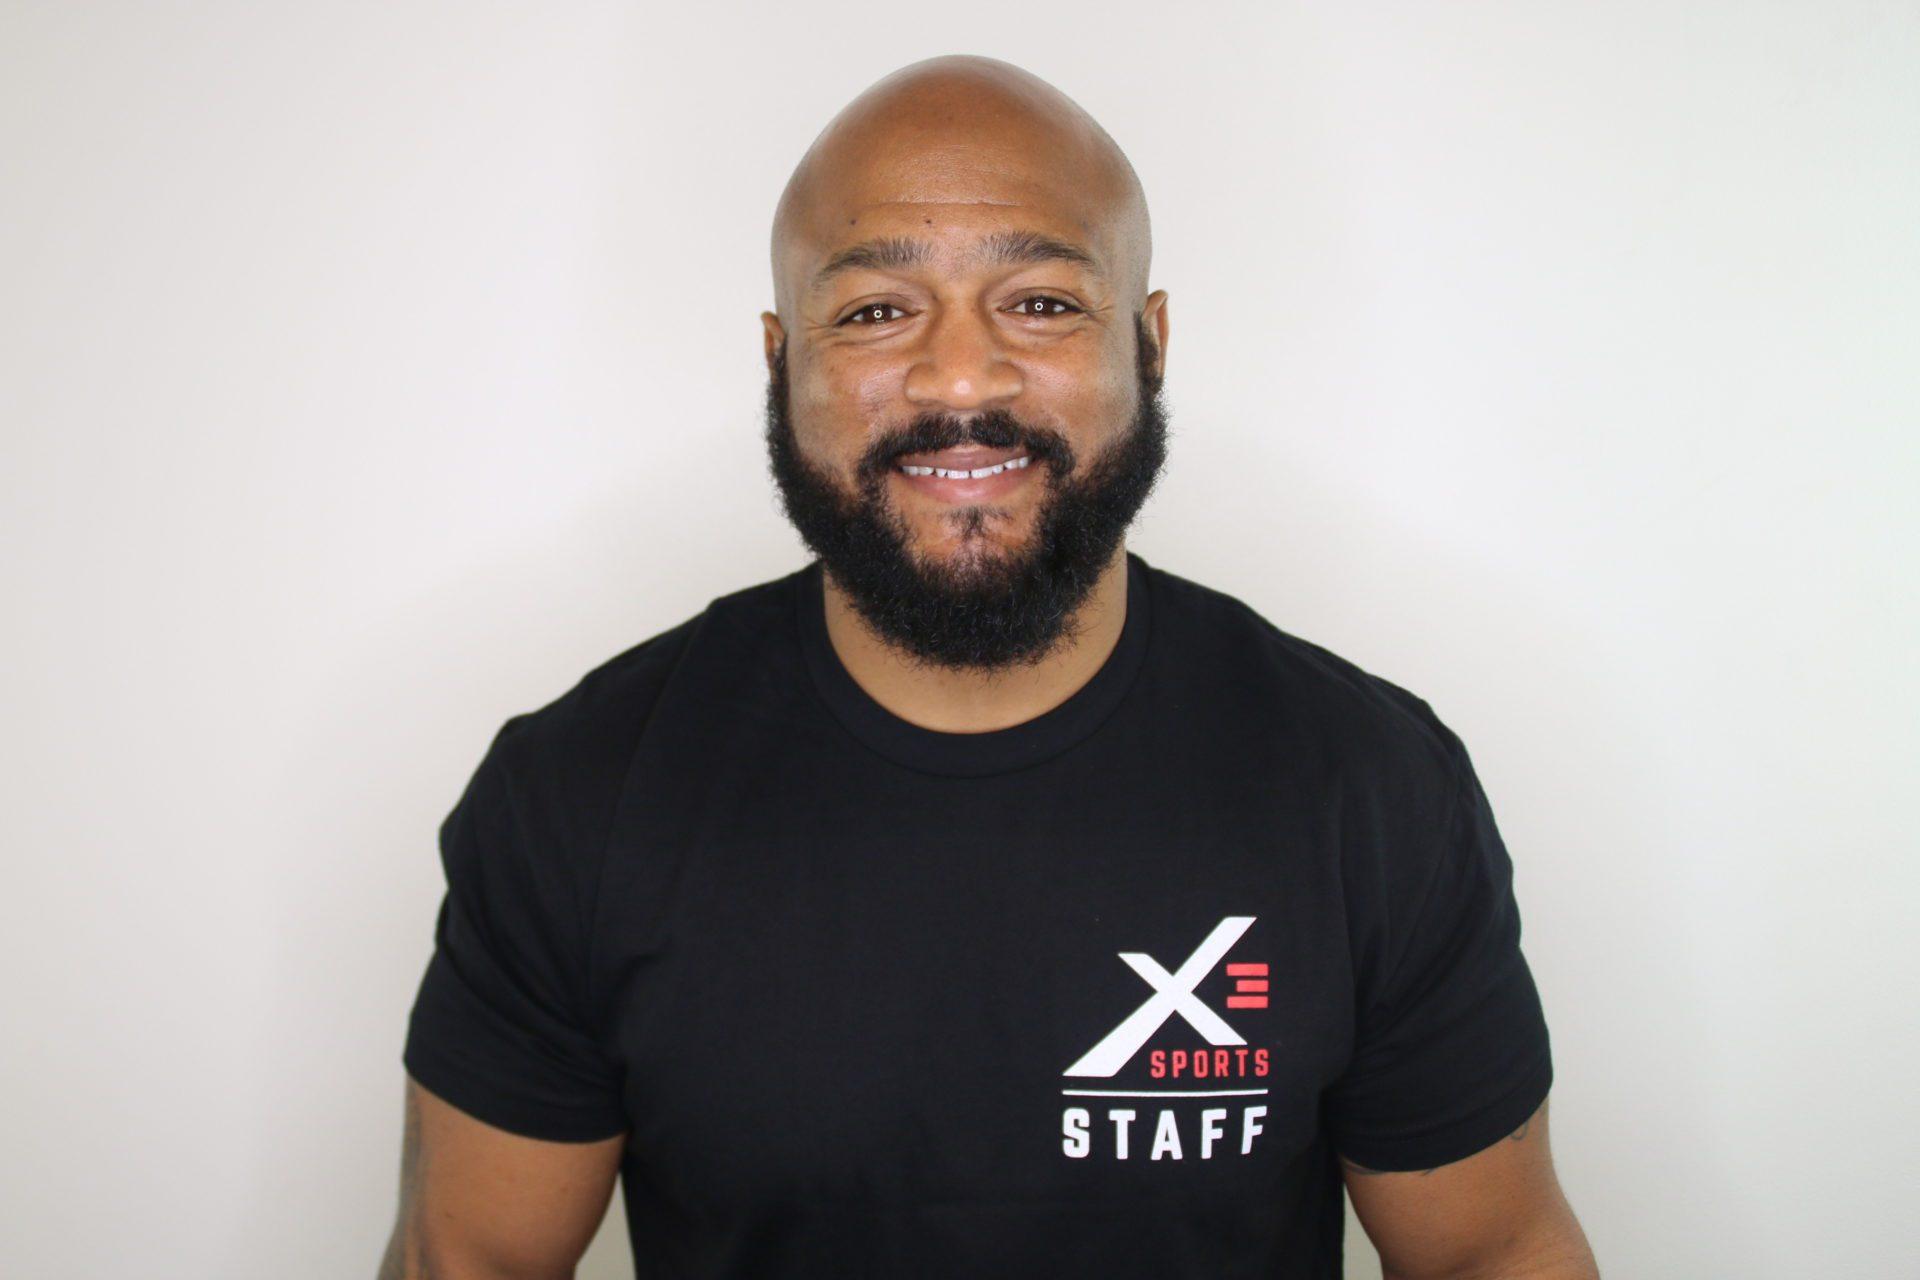 John Beverly | X3 Sports Employee | X3 Sports